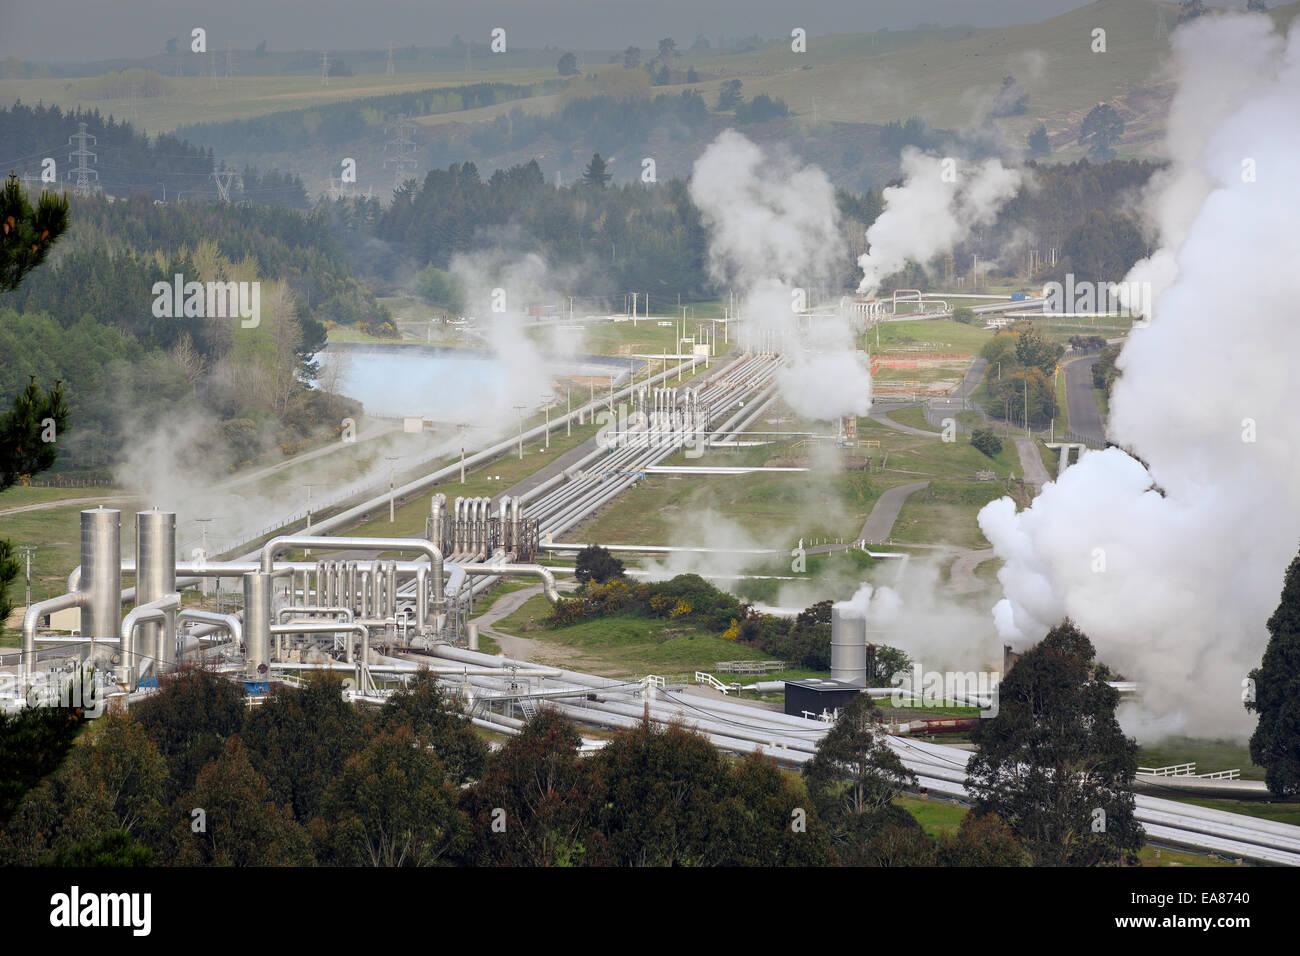 Wairakei Power Station, un vapor húmedo (energía geotérmica), Power Station en Taupo, Nueva Zelanda Imagen De Stock